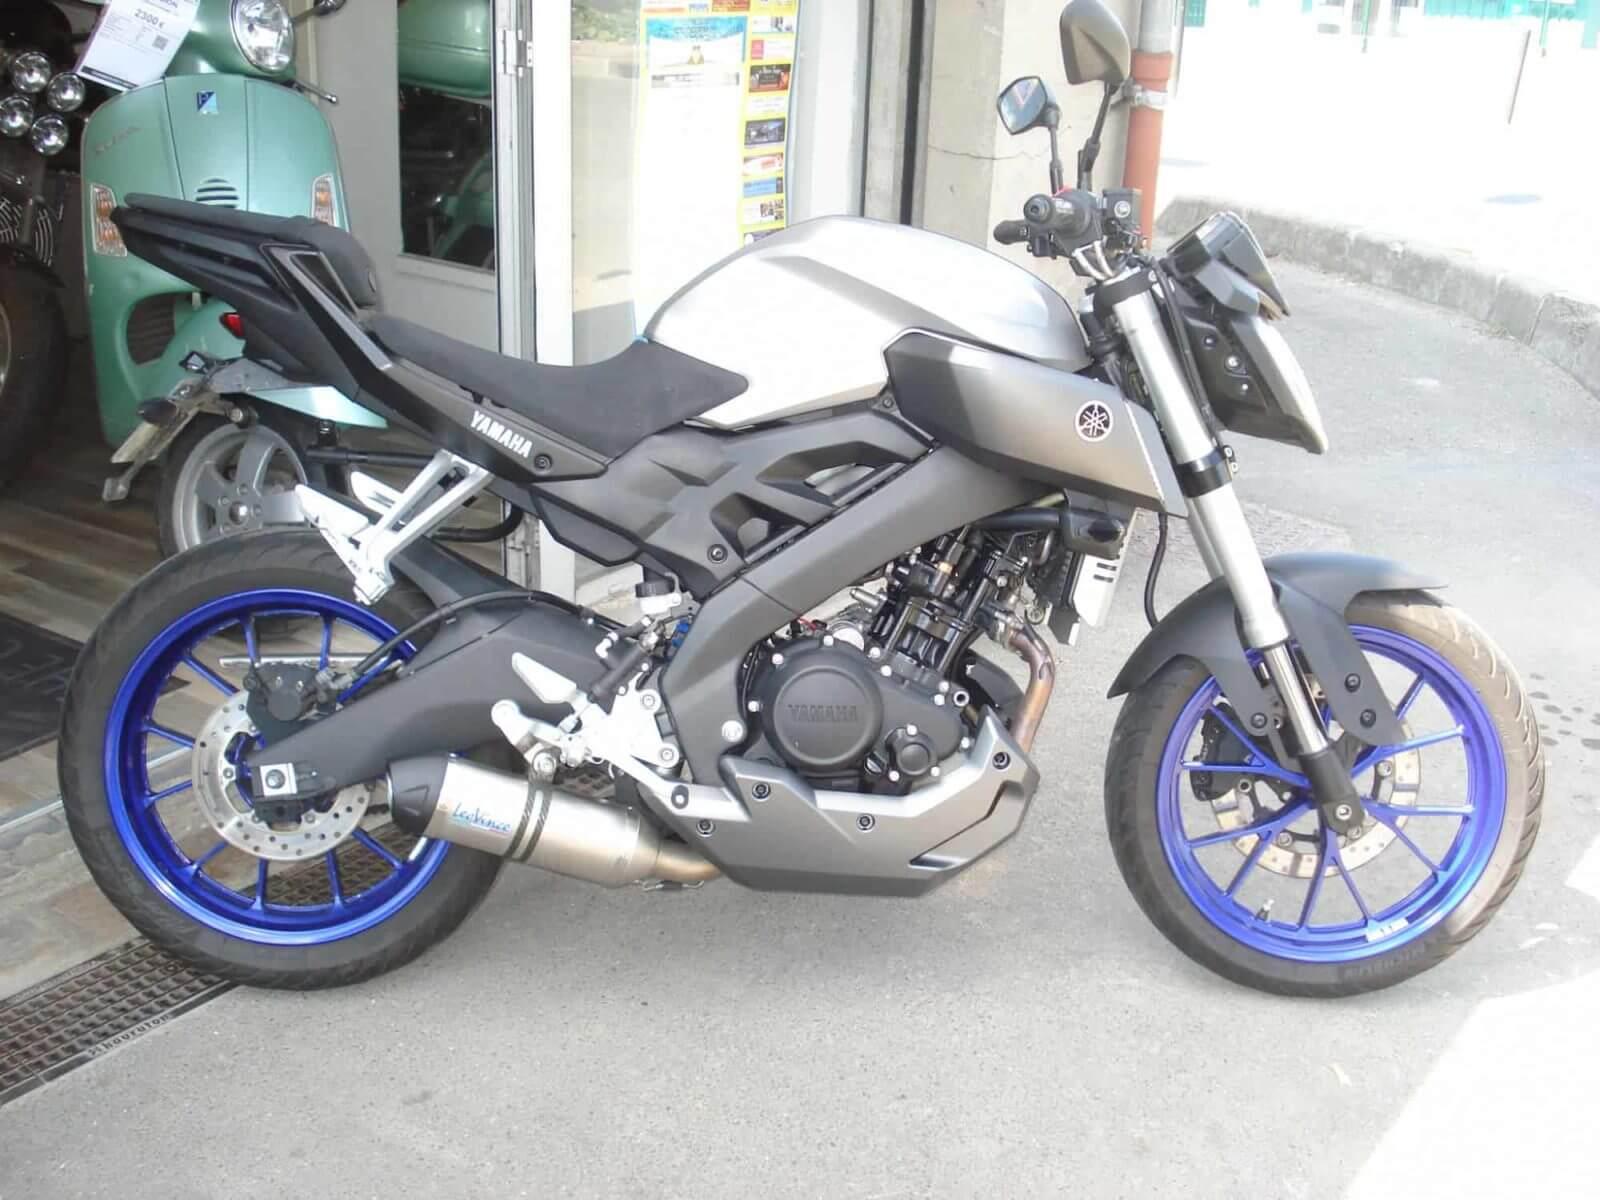 Vendu ! Yamaha MT 125 – 3300€